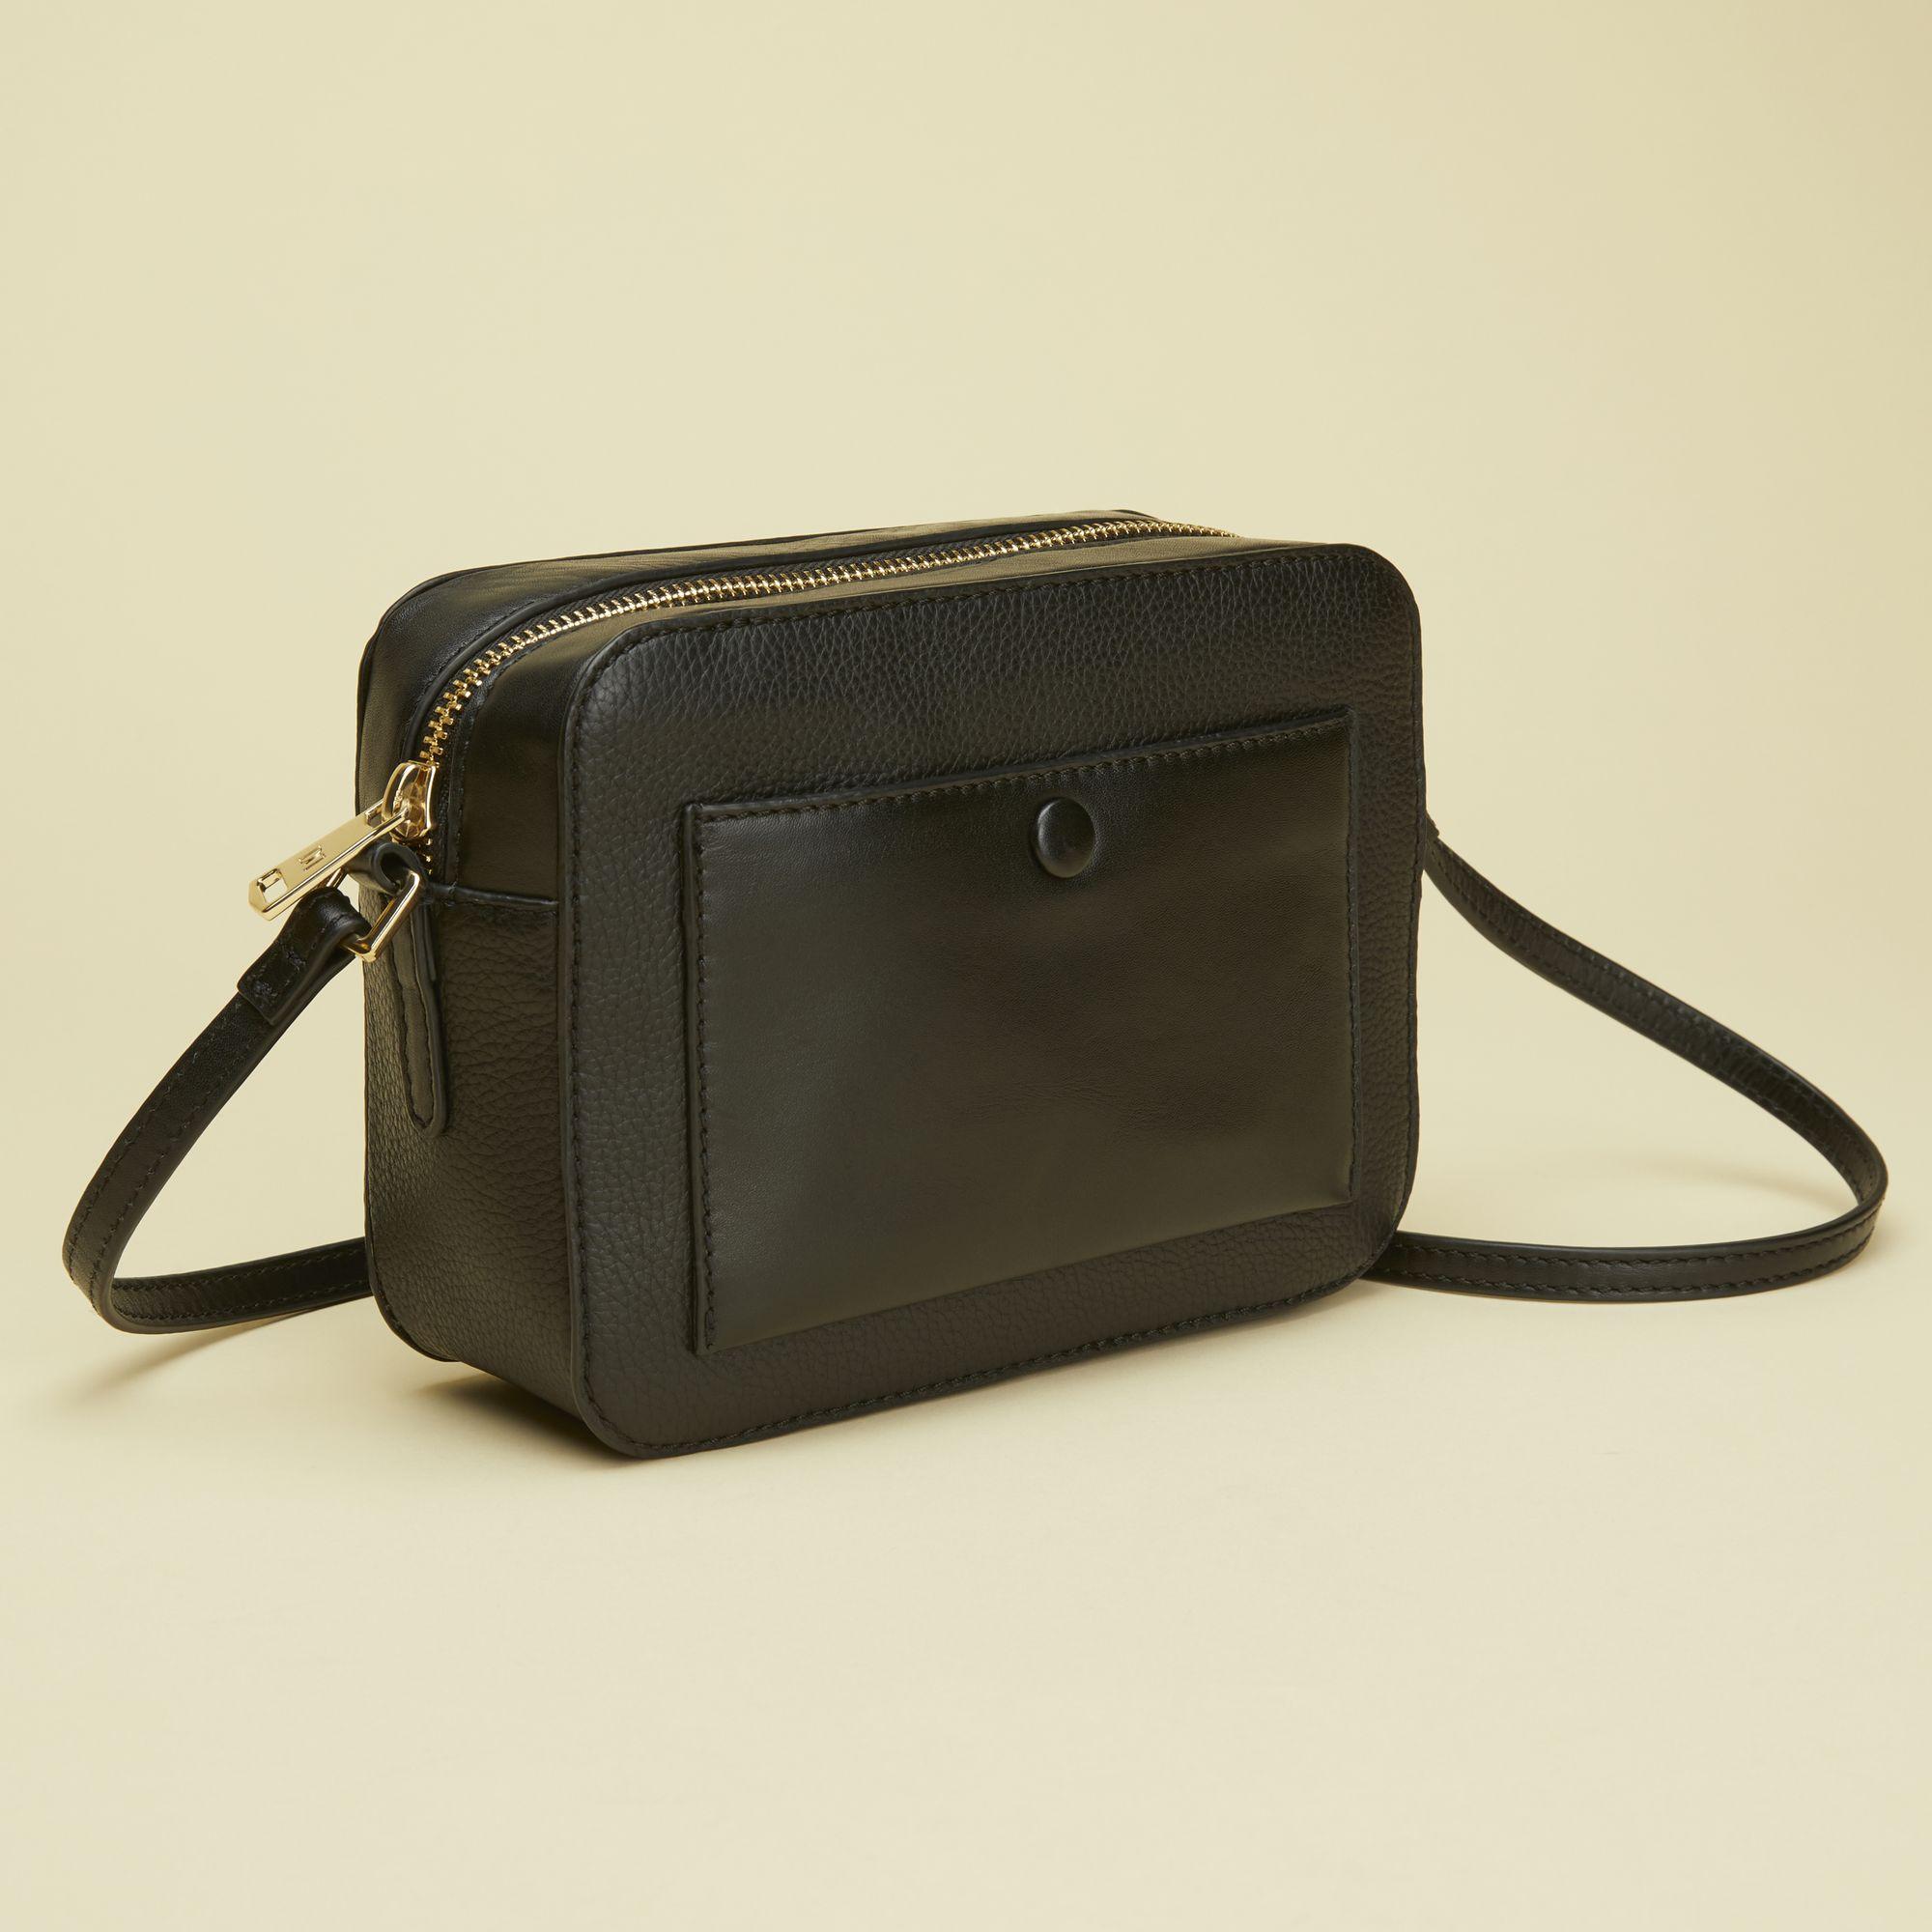 Don Donna Belinda Camerabag, väska i skinn, Svart